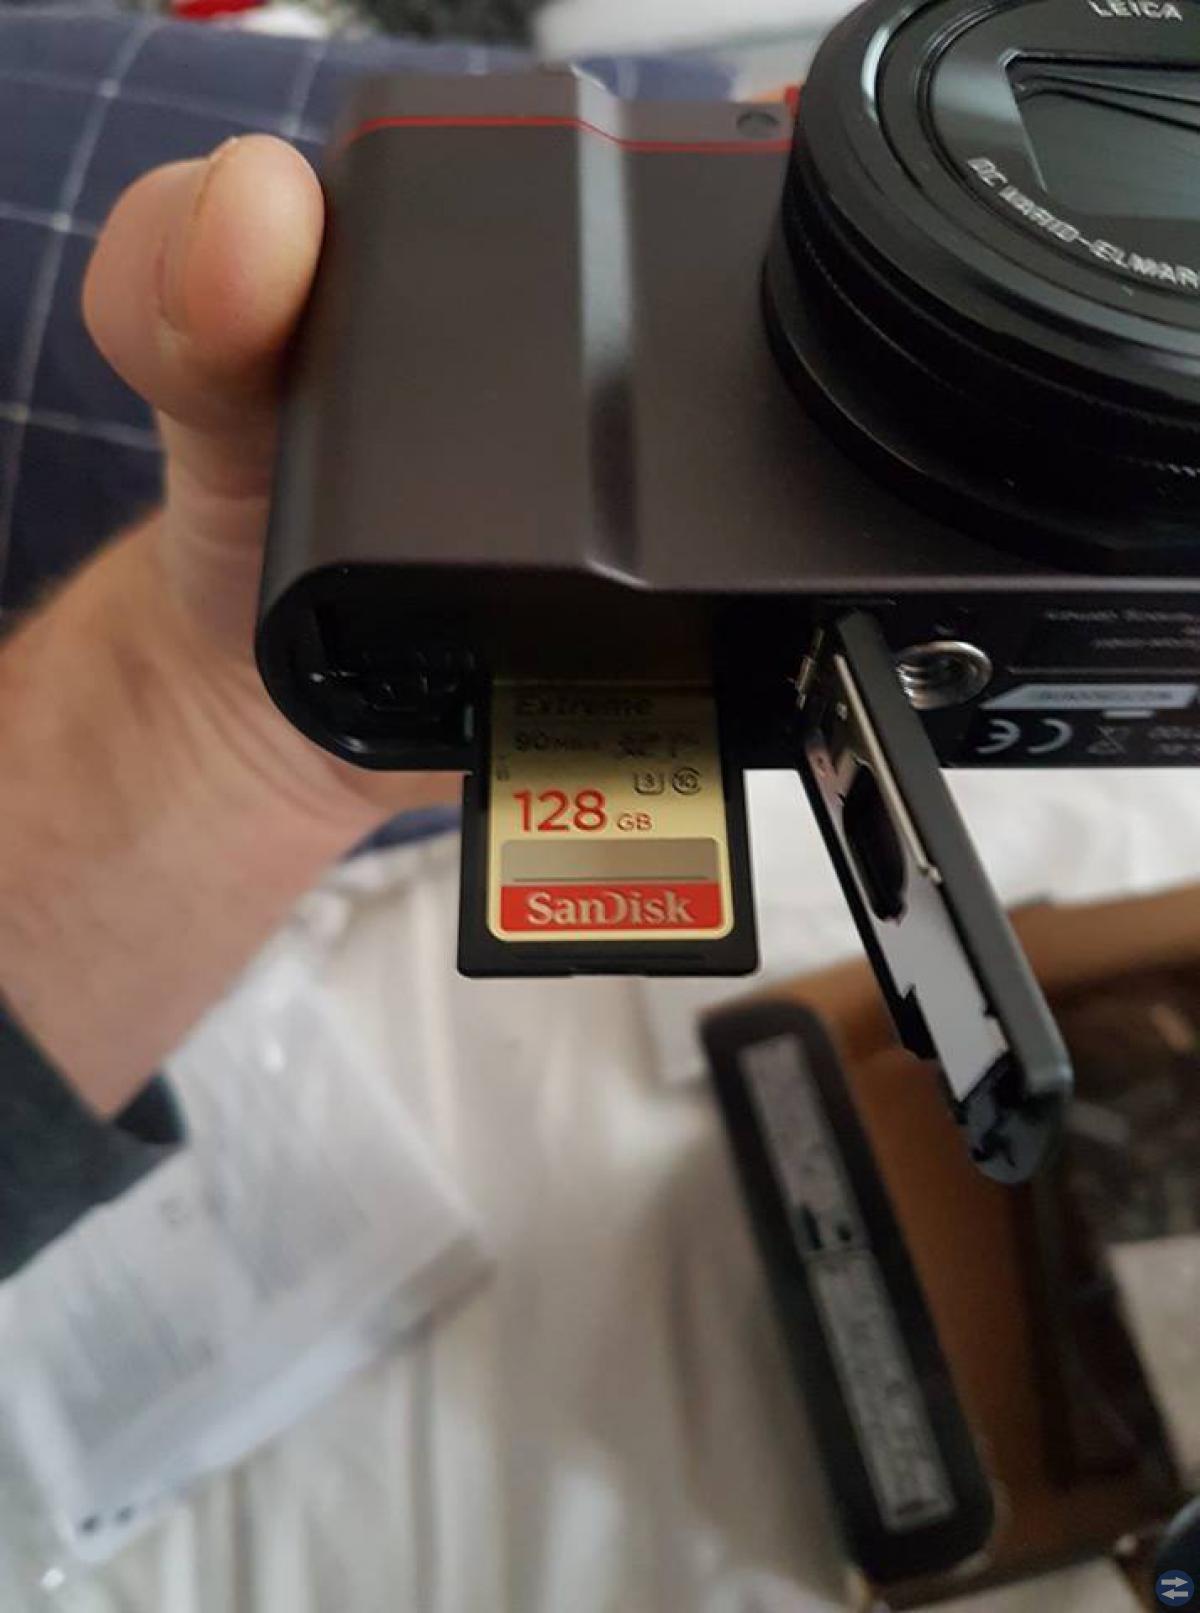 Panasonic DMC-TZ100 nyskick inkl. 128g minneskort